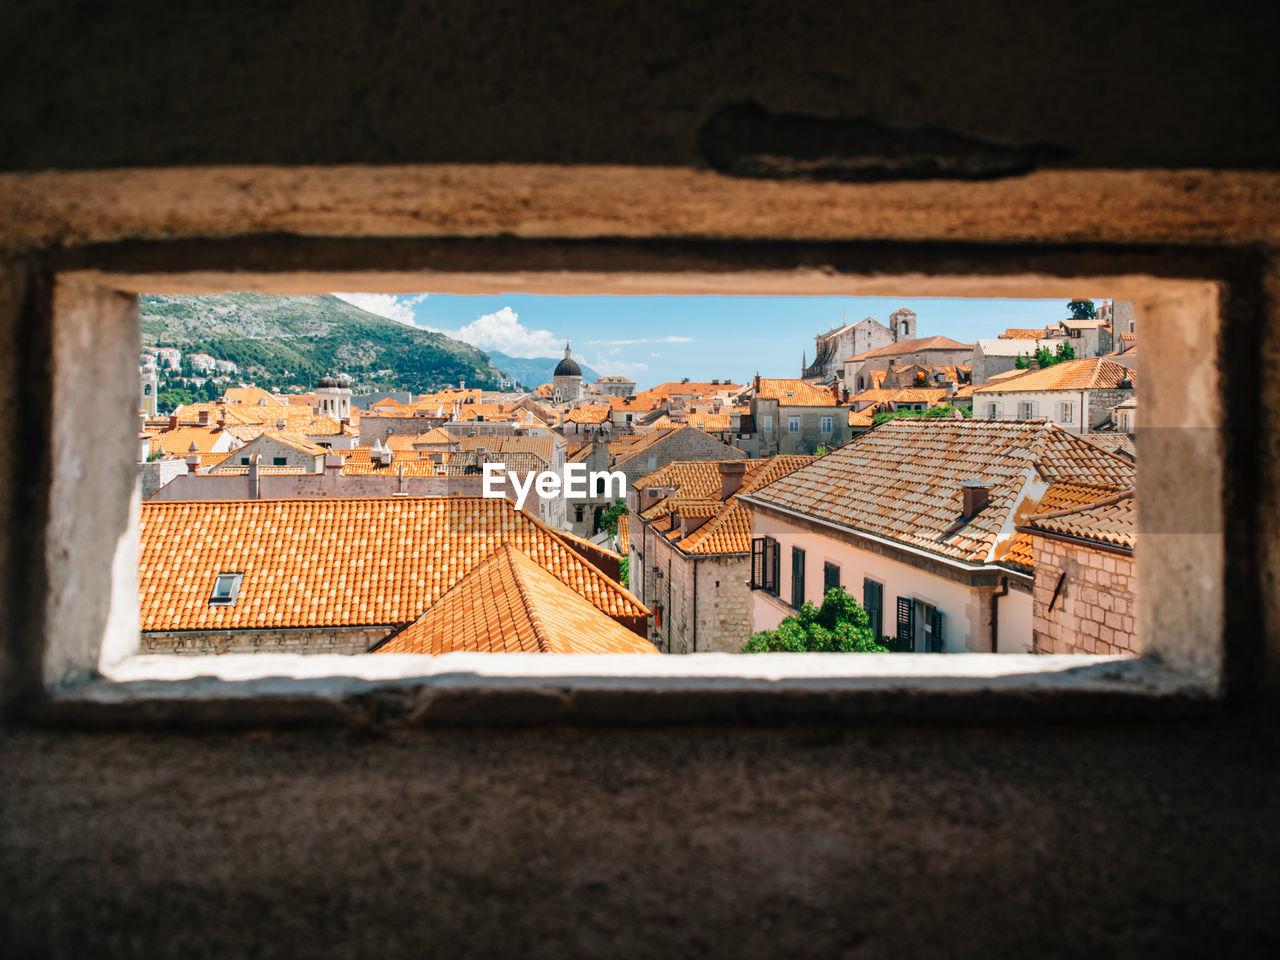 Residential Buildings In Town As Seen Through Window